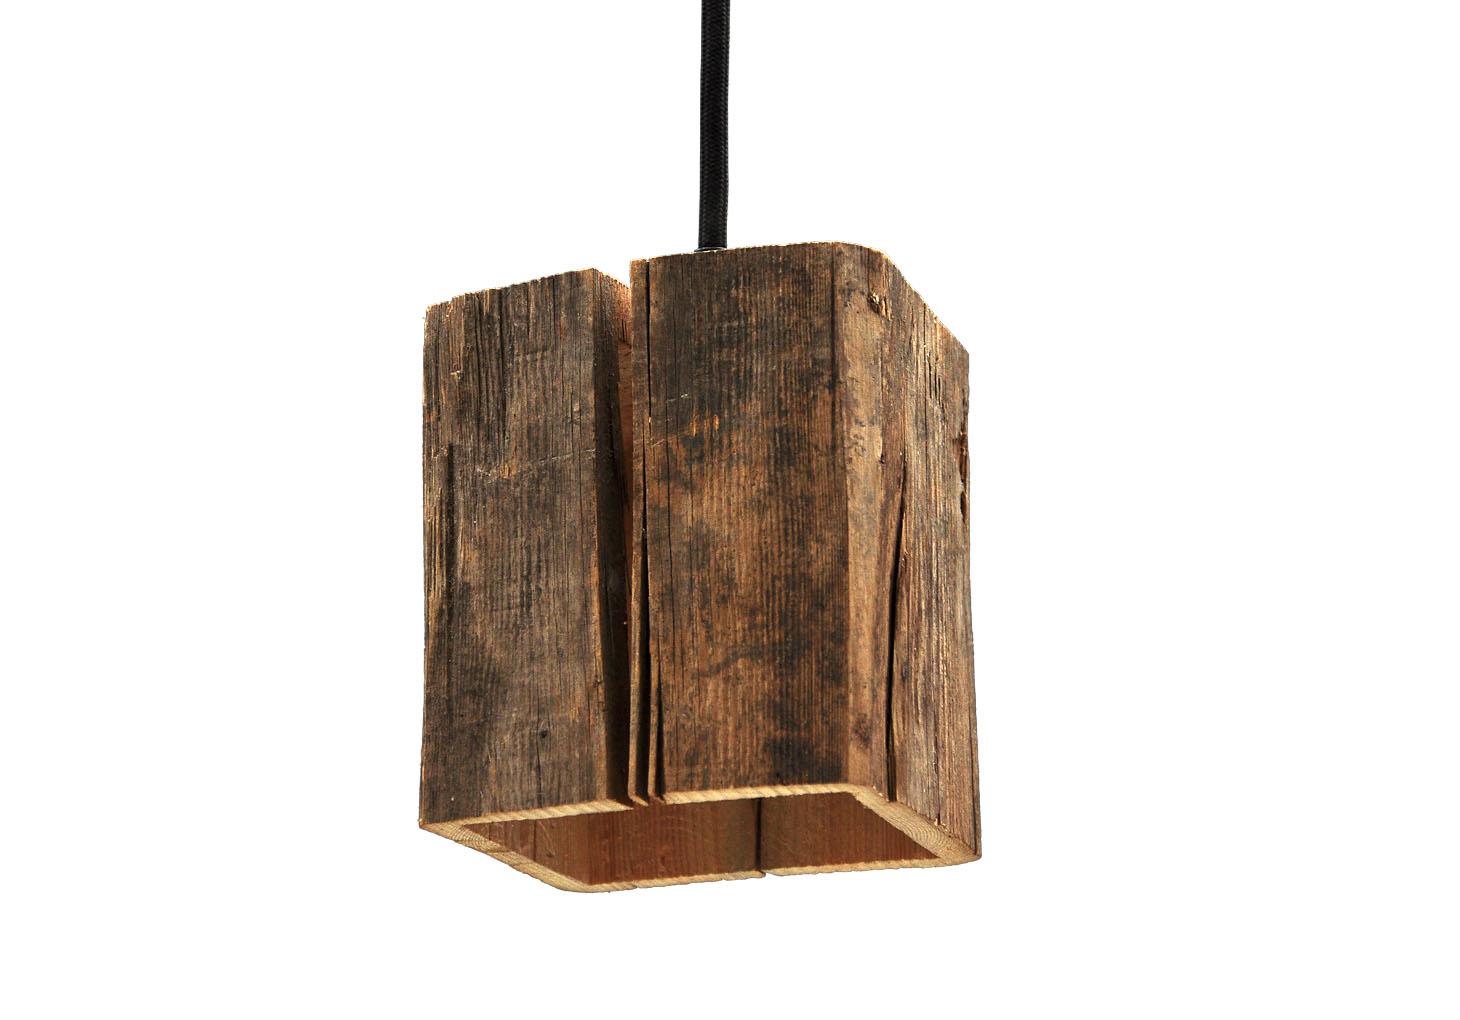 almleuchten design lighting made of old timber